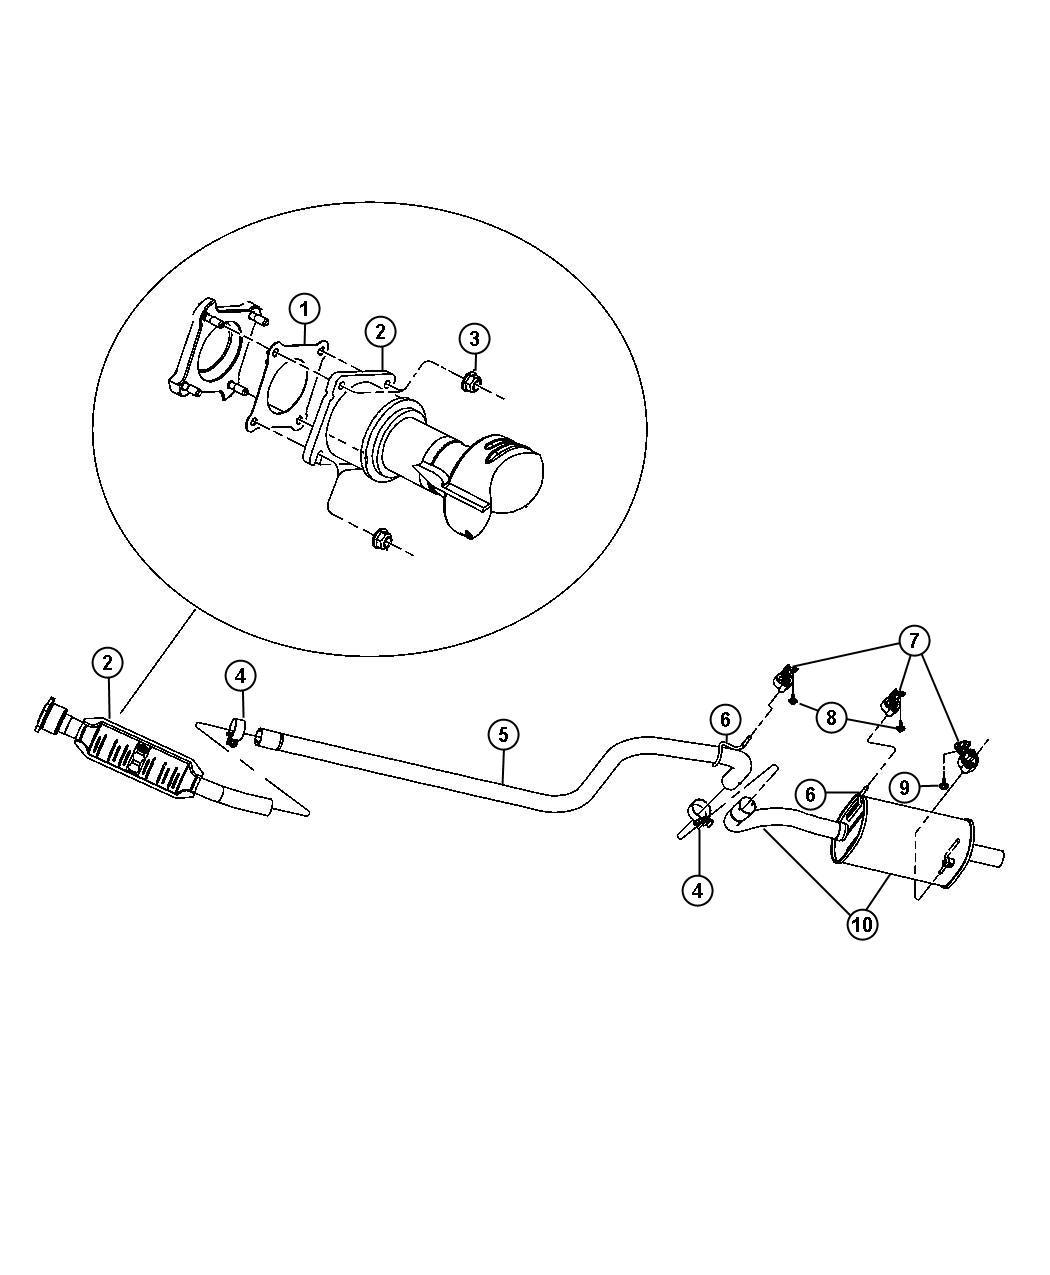 Chrysler Pt Cruiser Pipe Exhaust Extension Intermediate